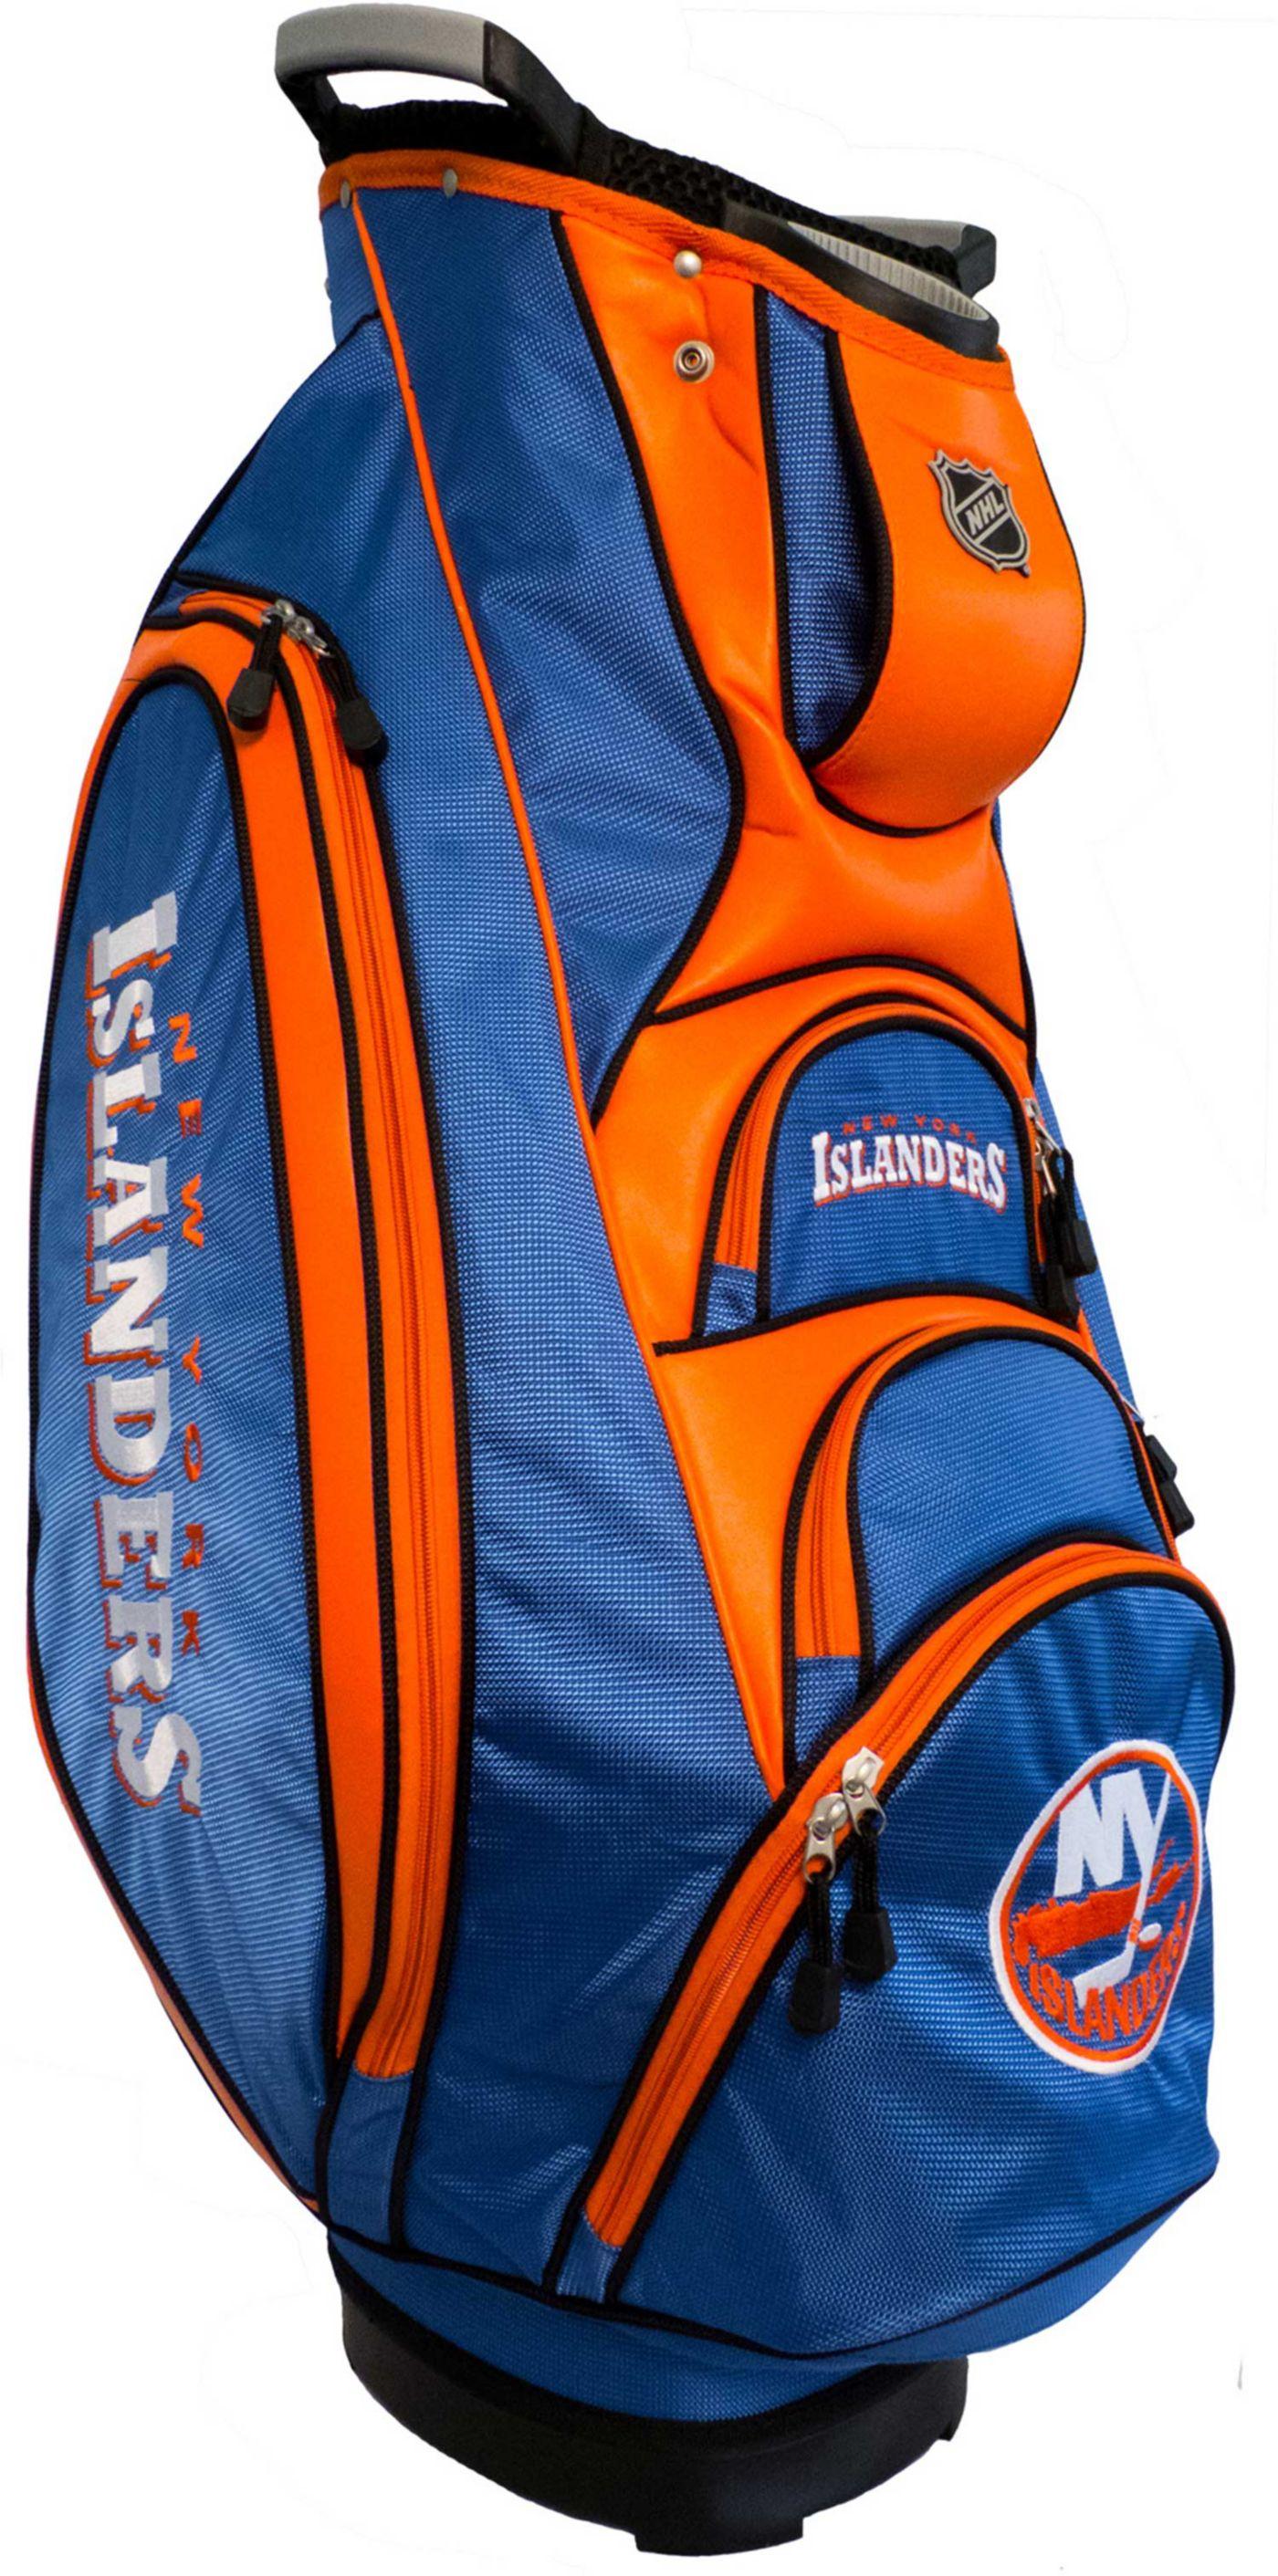 Team Golf Victory New York Islanders Cart Bag